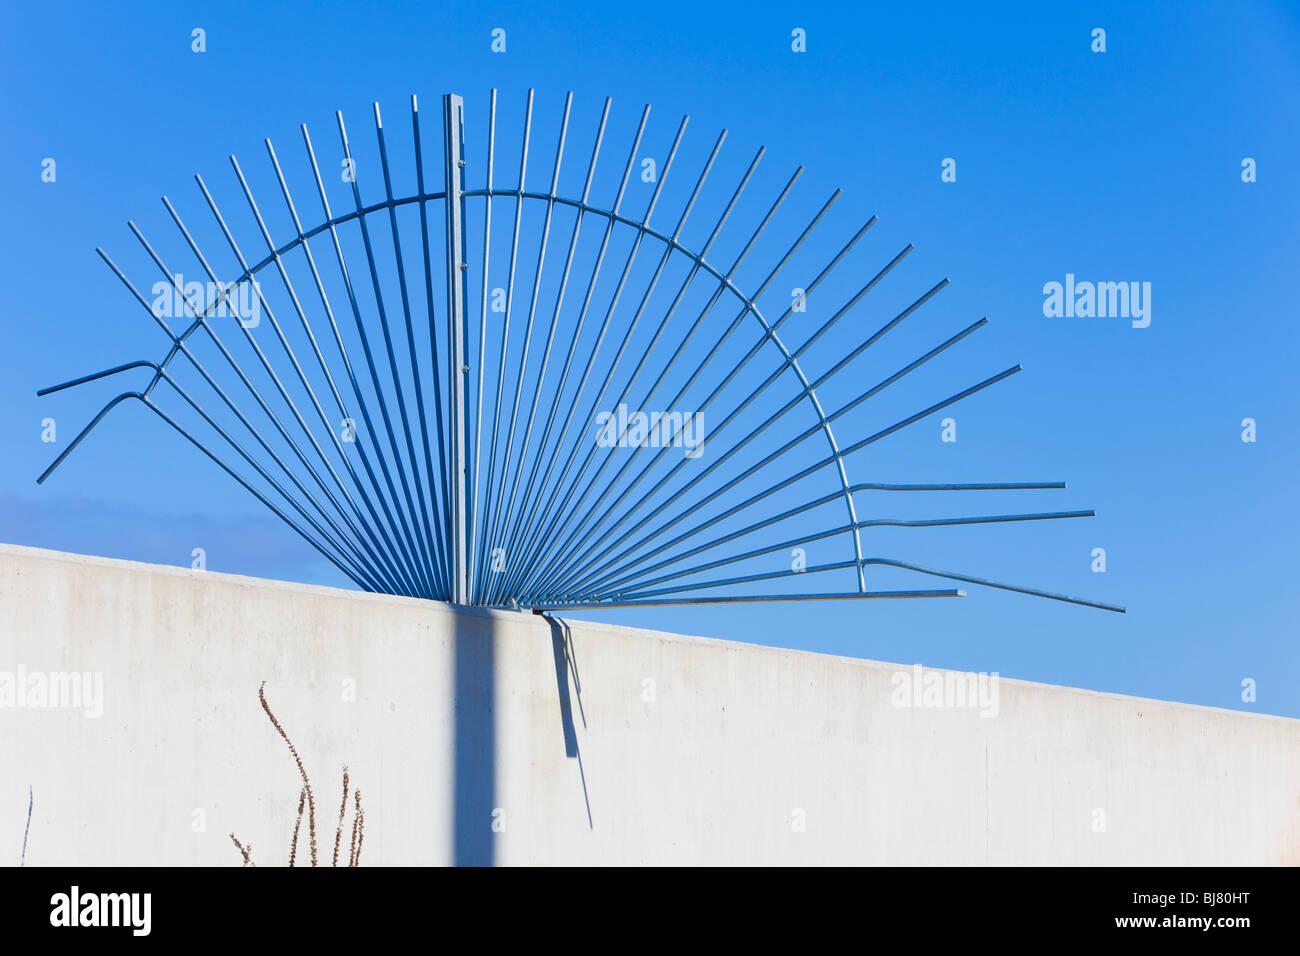 Anti climb collar Stock Photo: 28450292 - Alamy